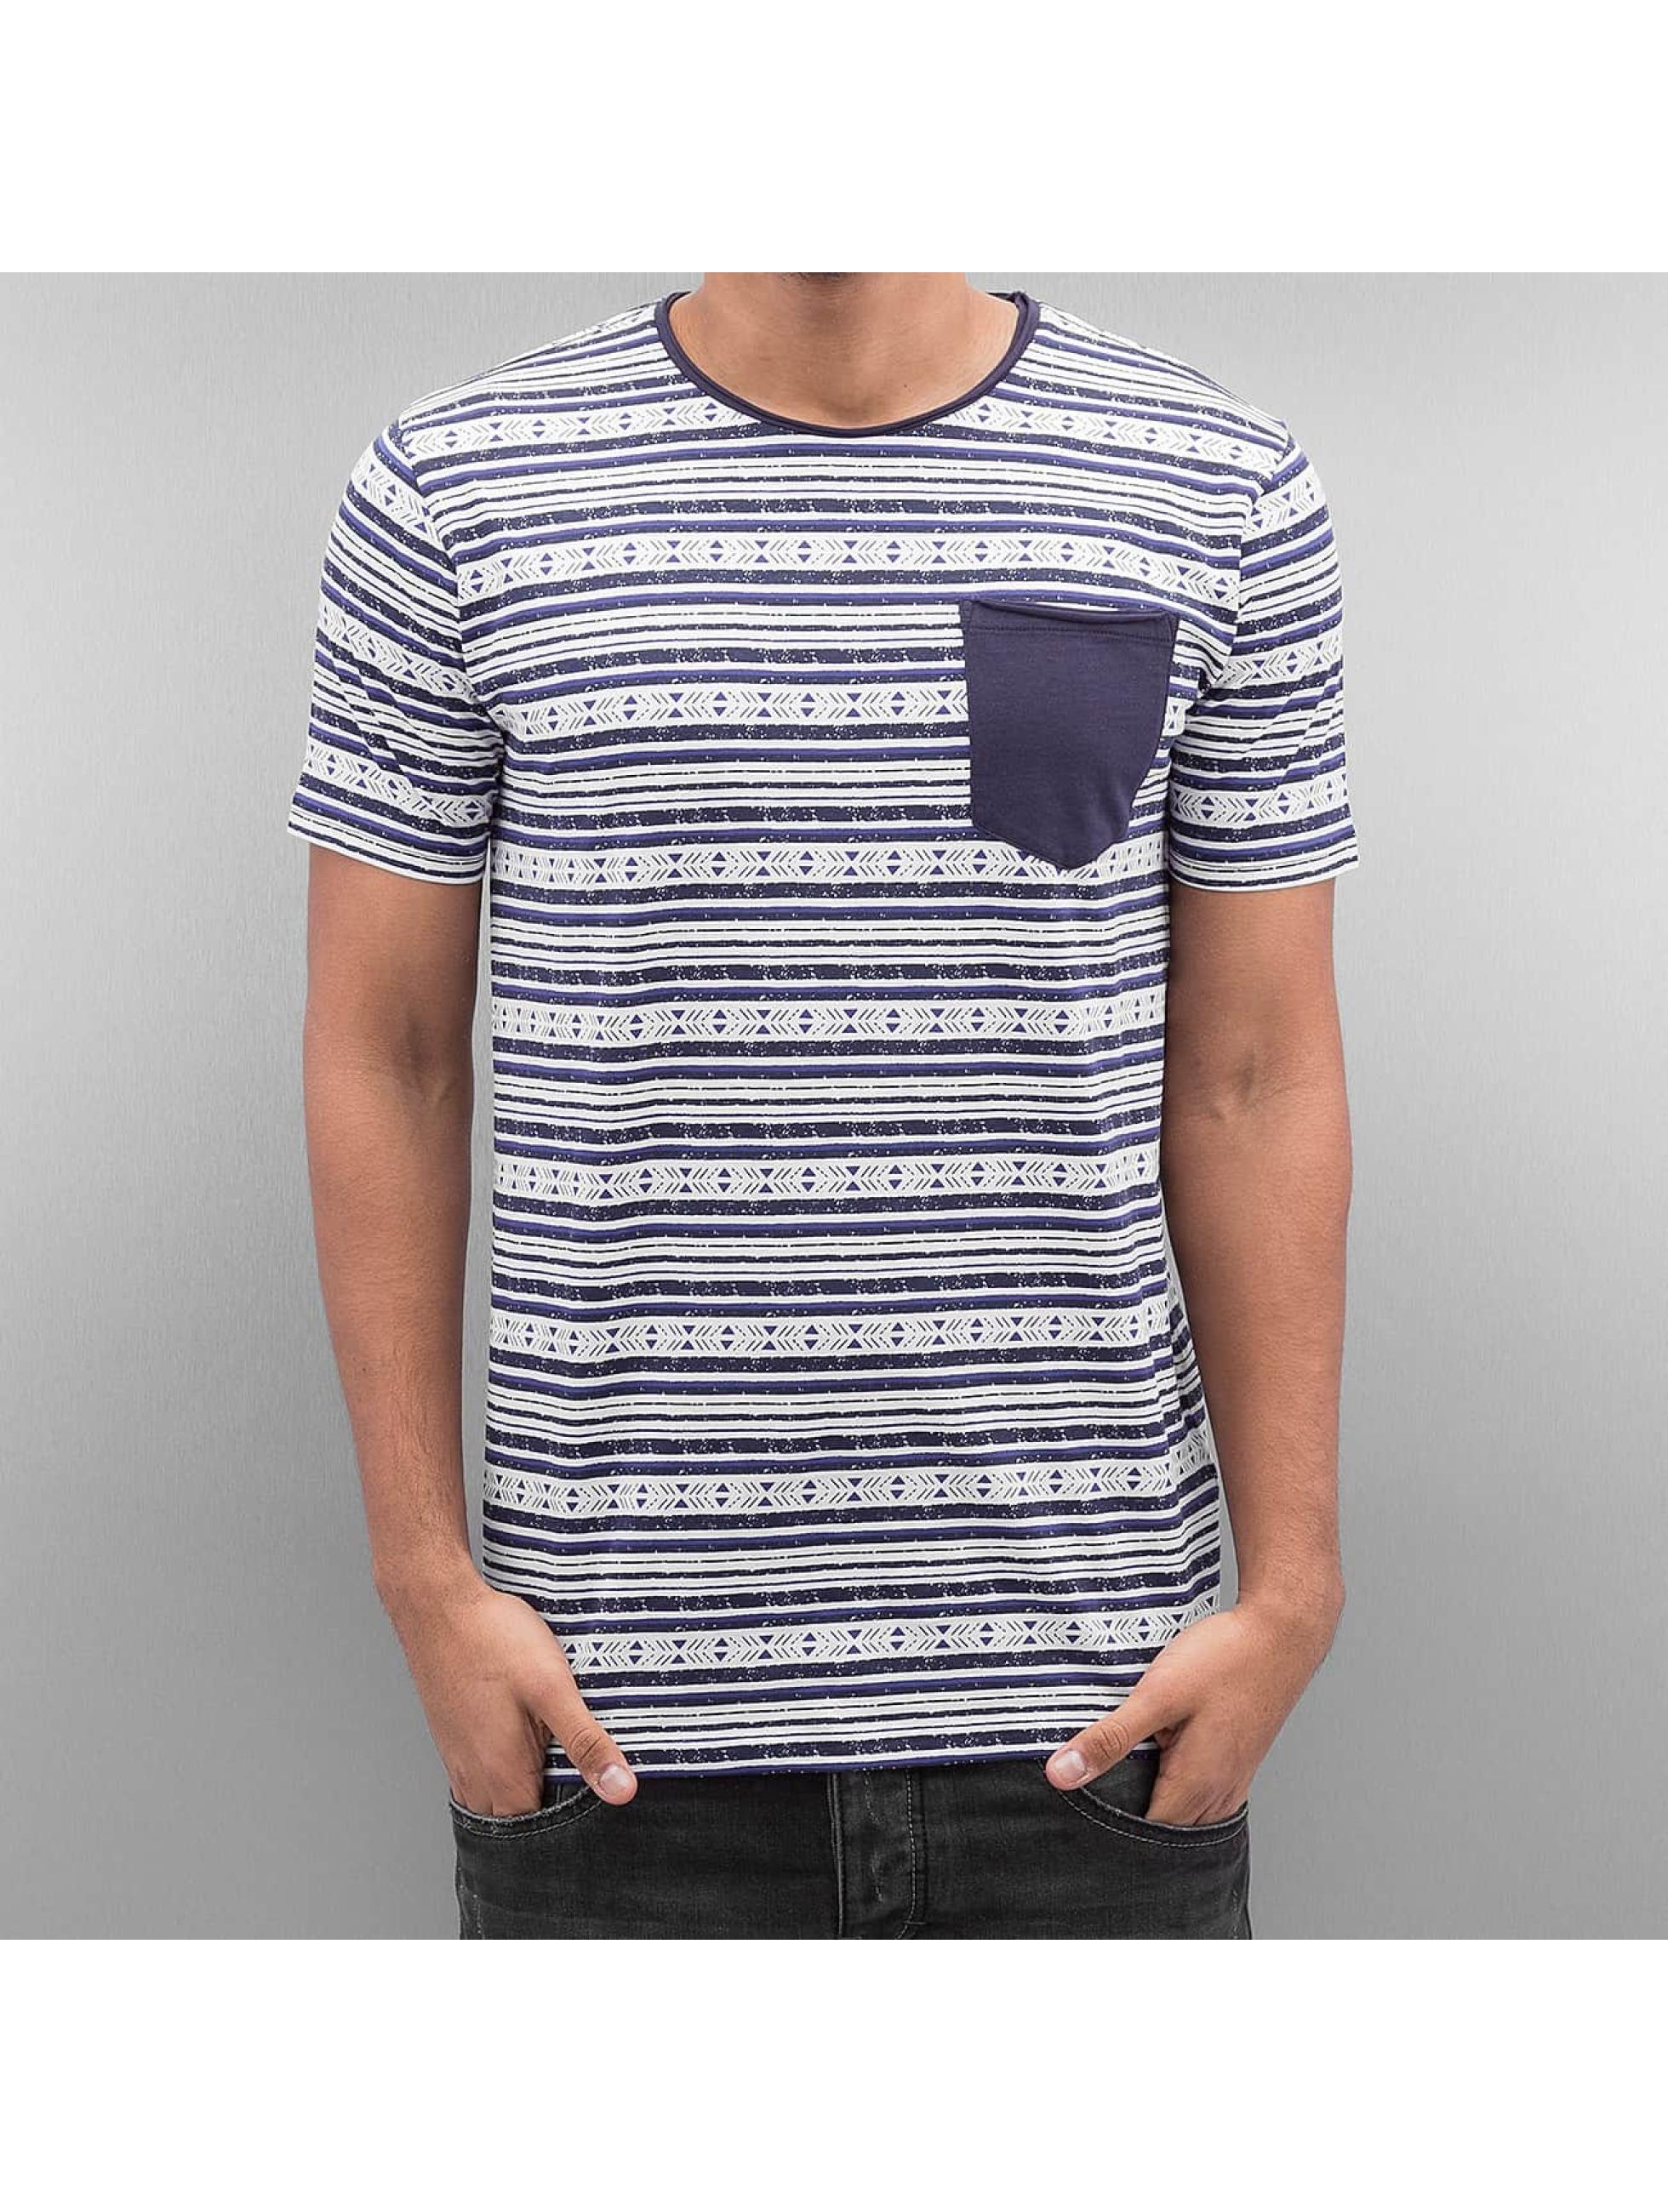 SHINE Original Stripes T-Shirt Dark Blue Sale Angebote